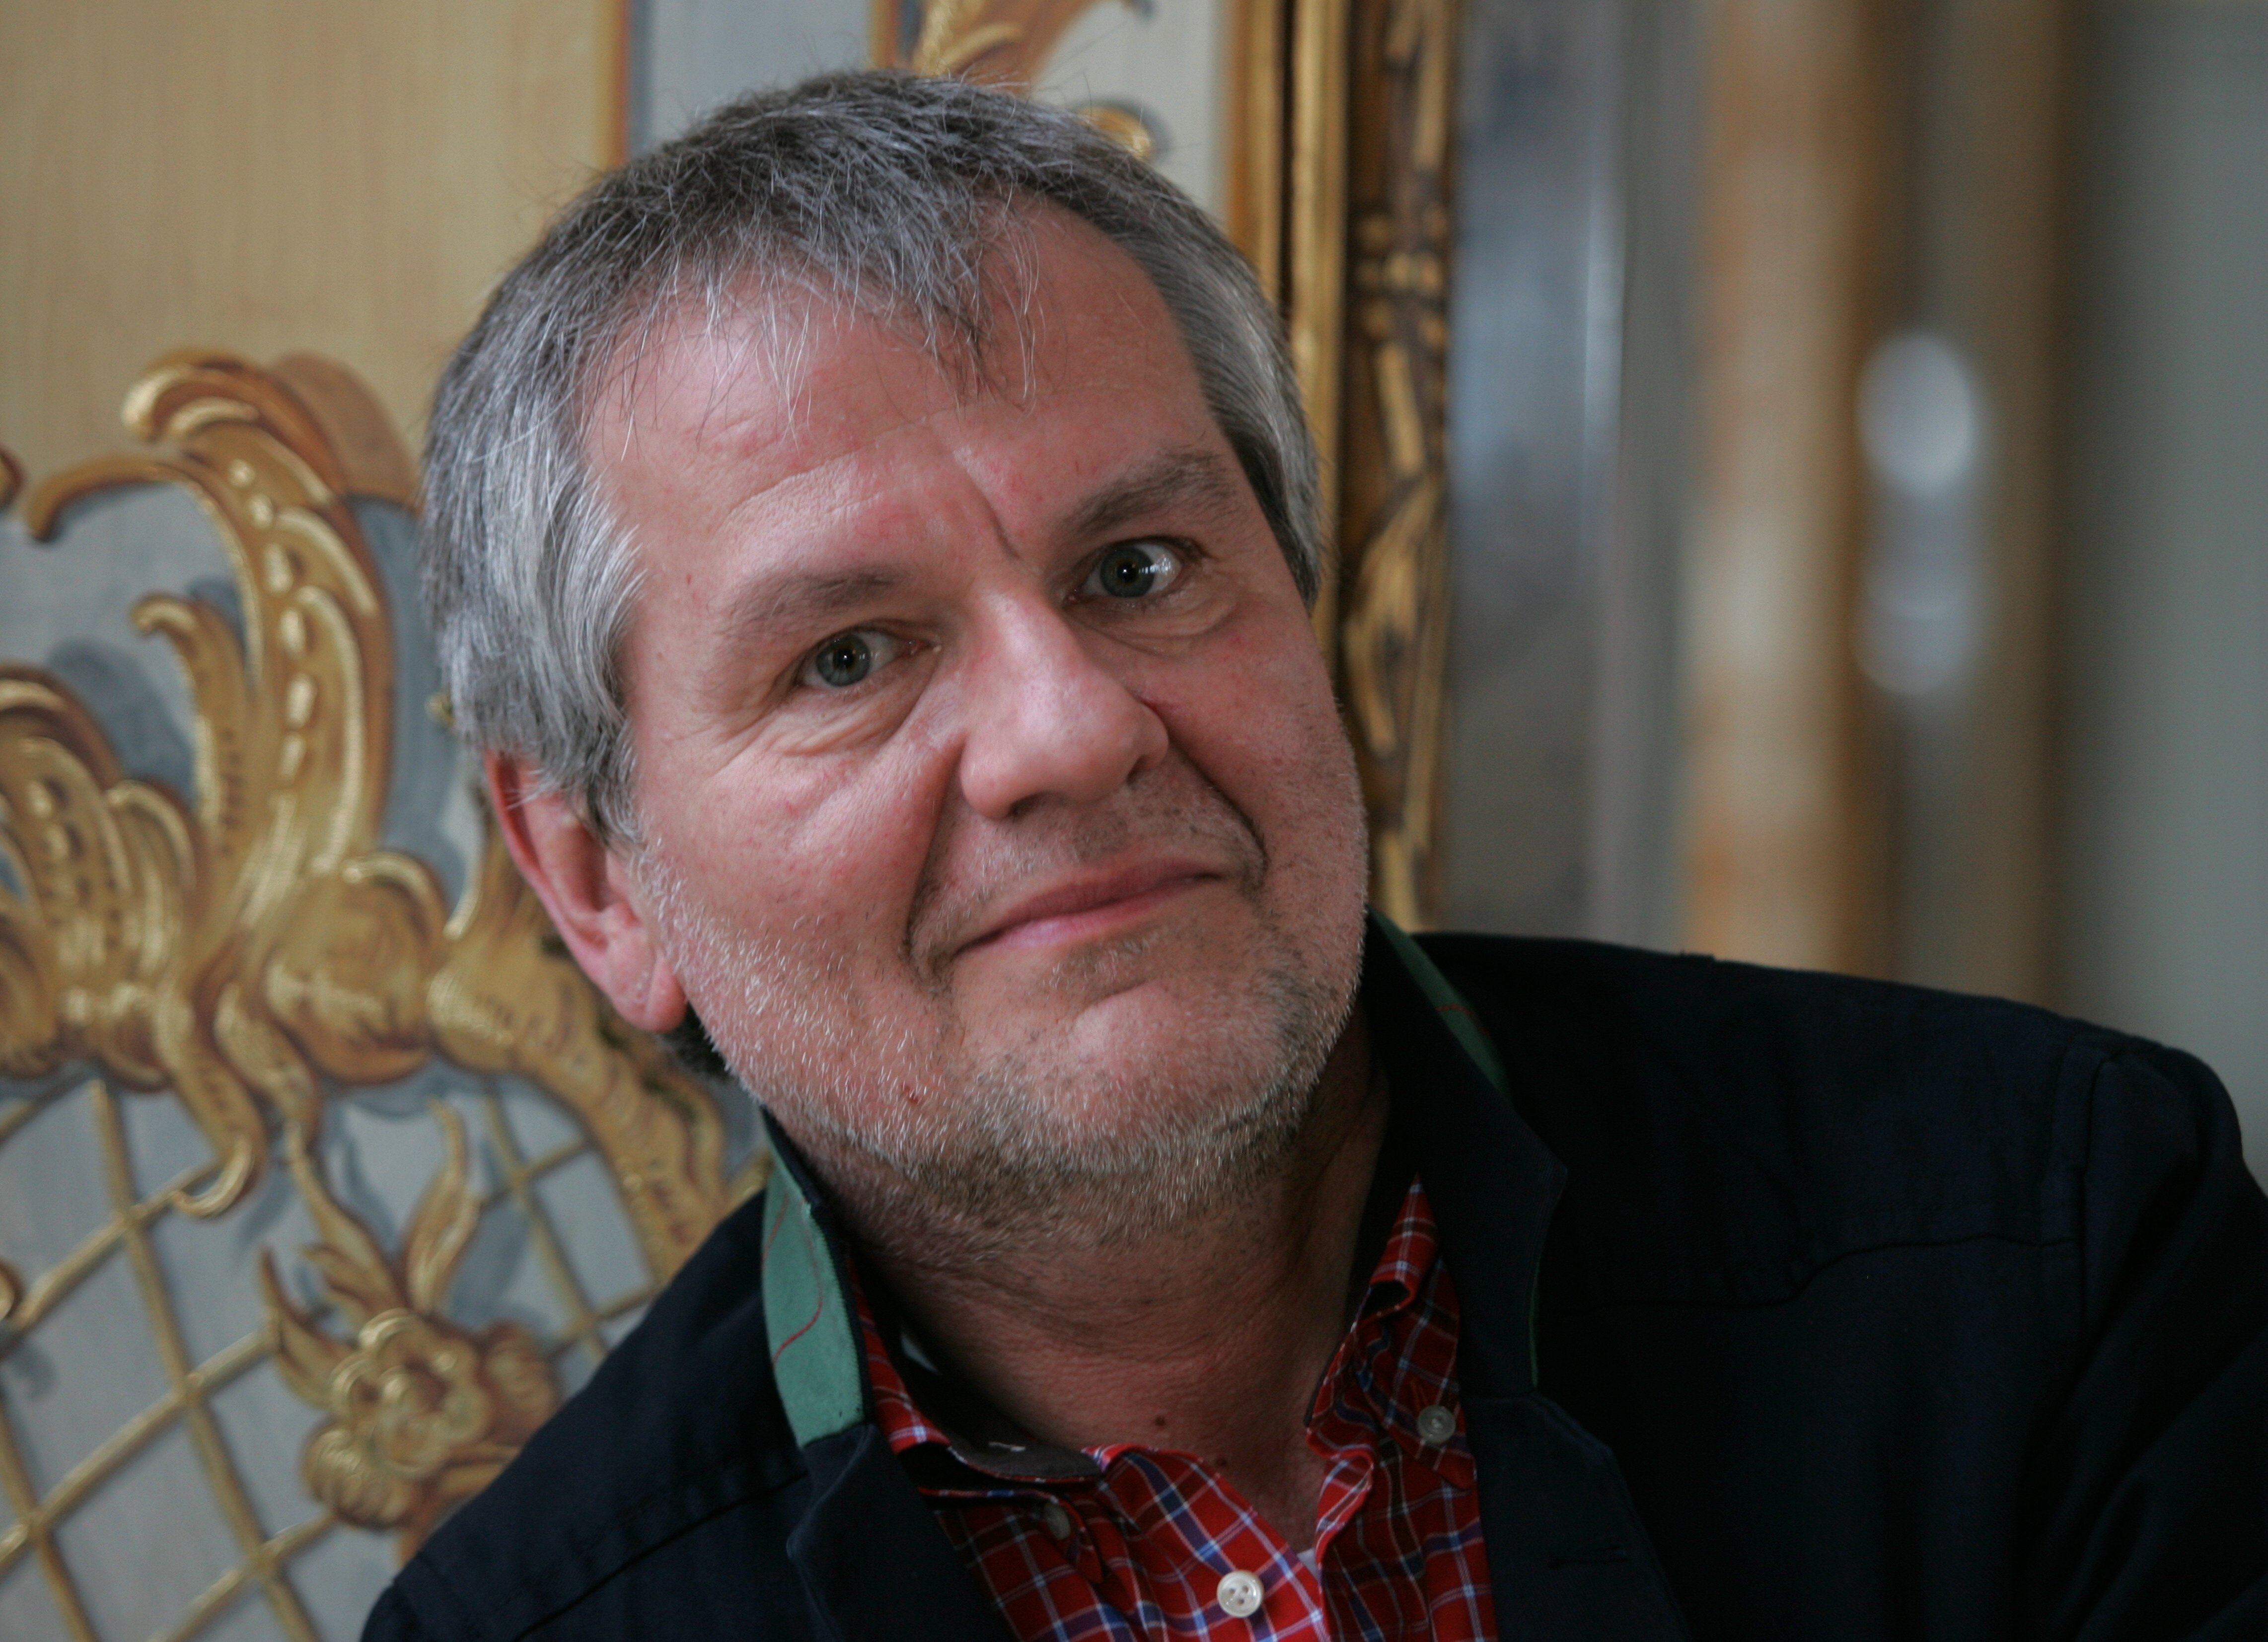 Reinhard Goebel